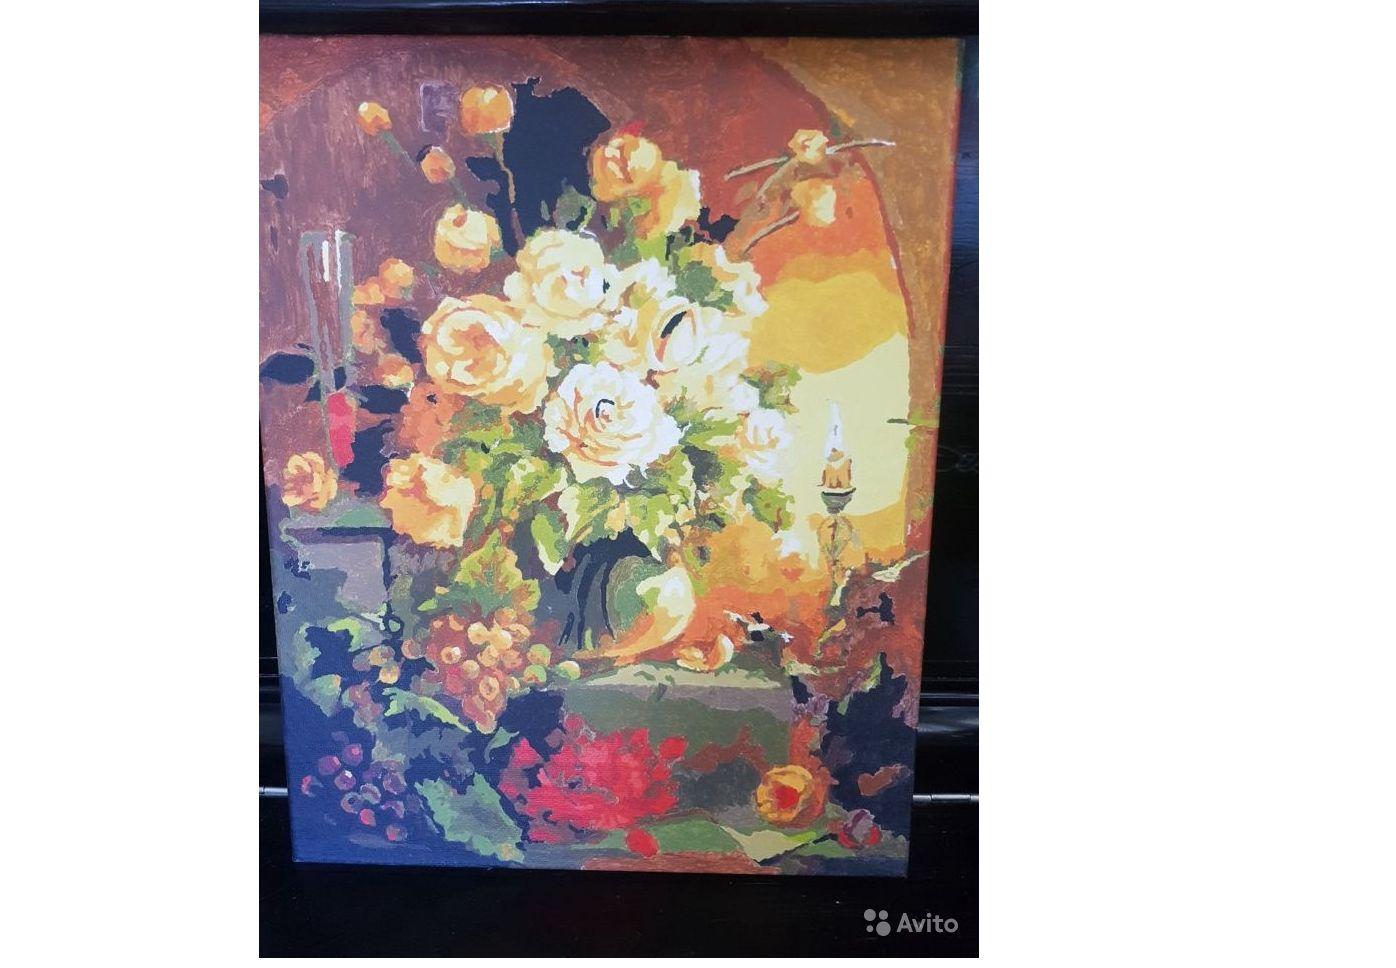 Ярославец продает «картину Леонардо да Винчи» за 25 миллионов рублей